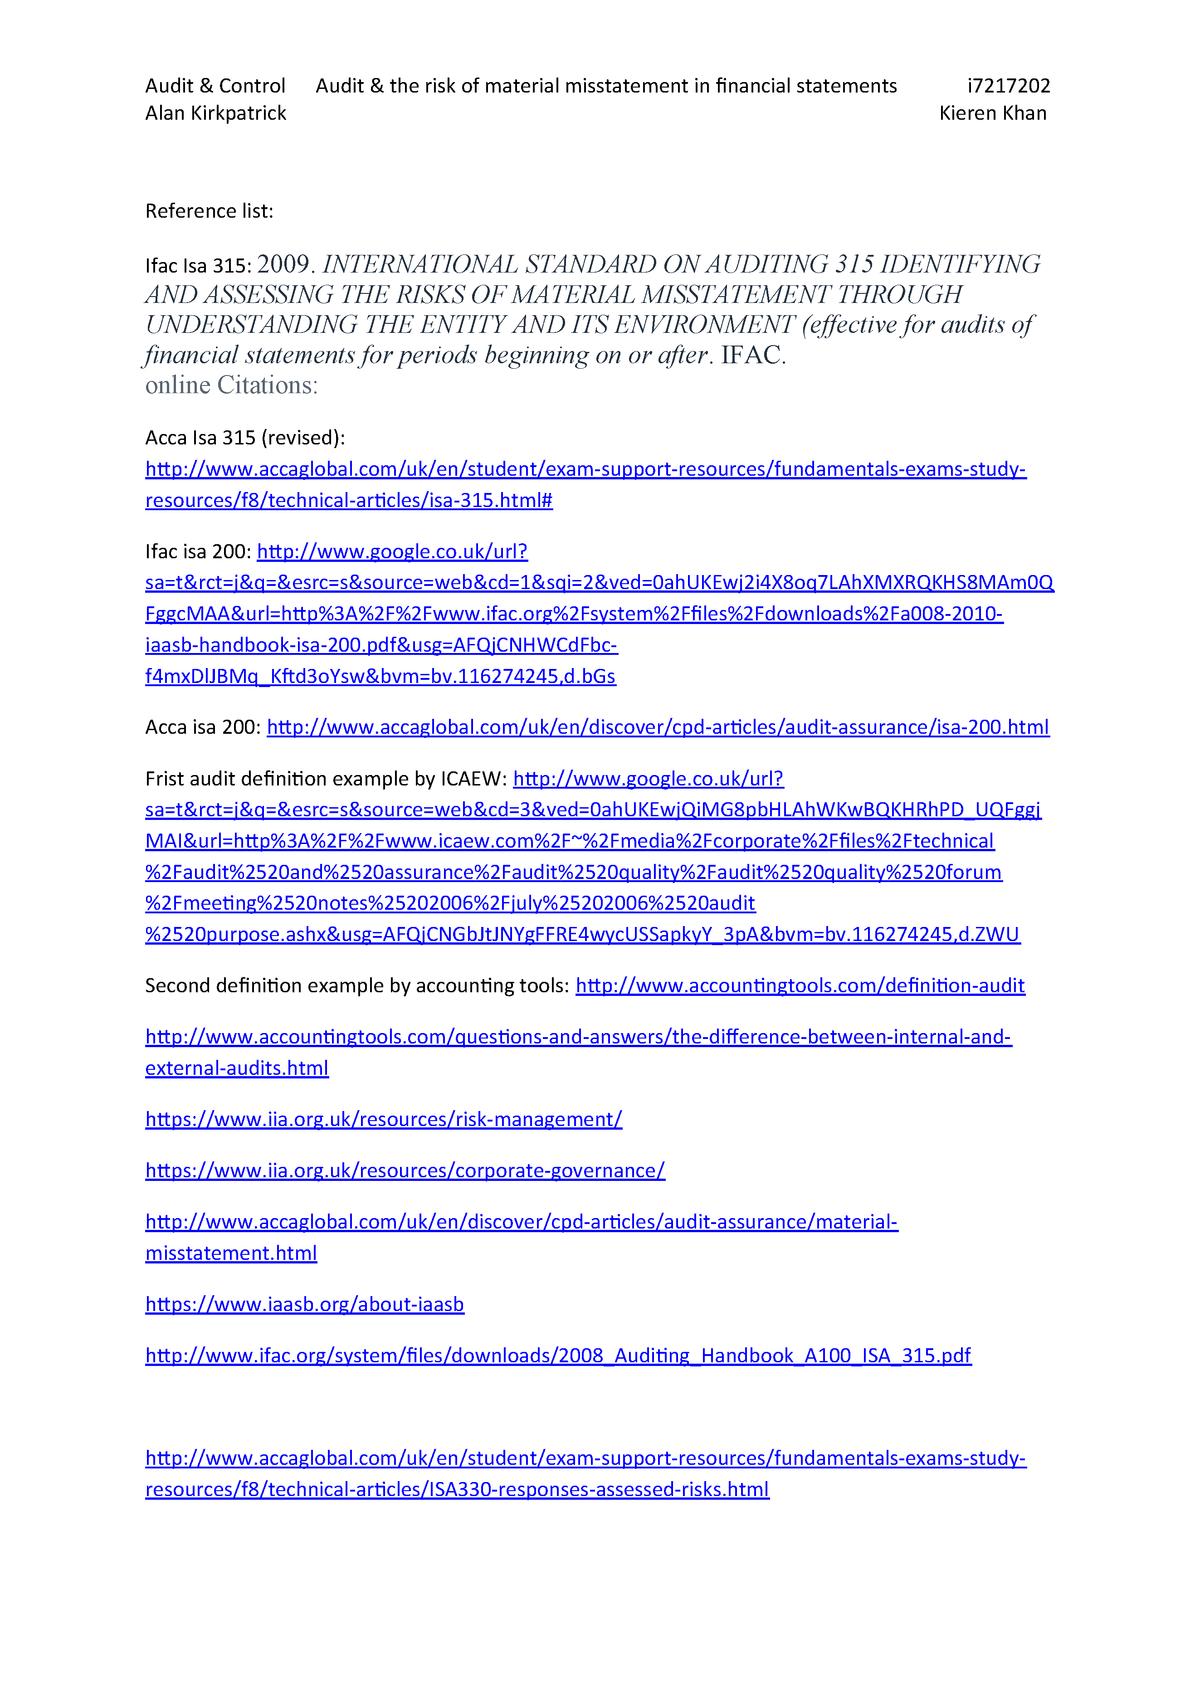 audit and control essay - Audit & Control - StuDocu